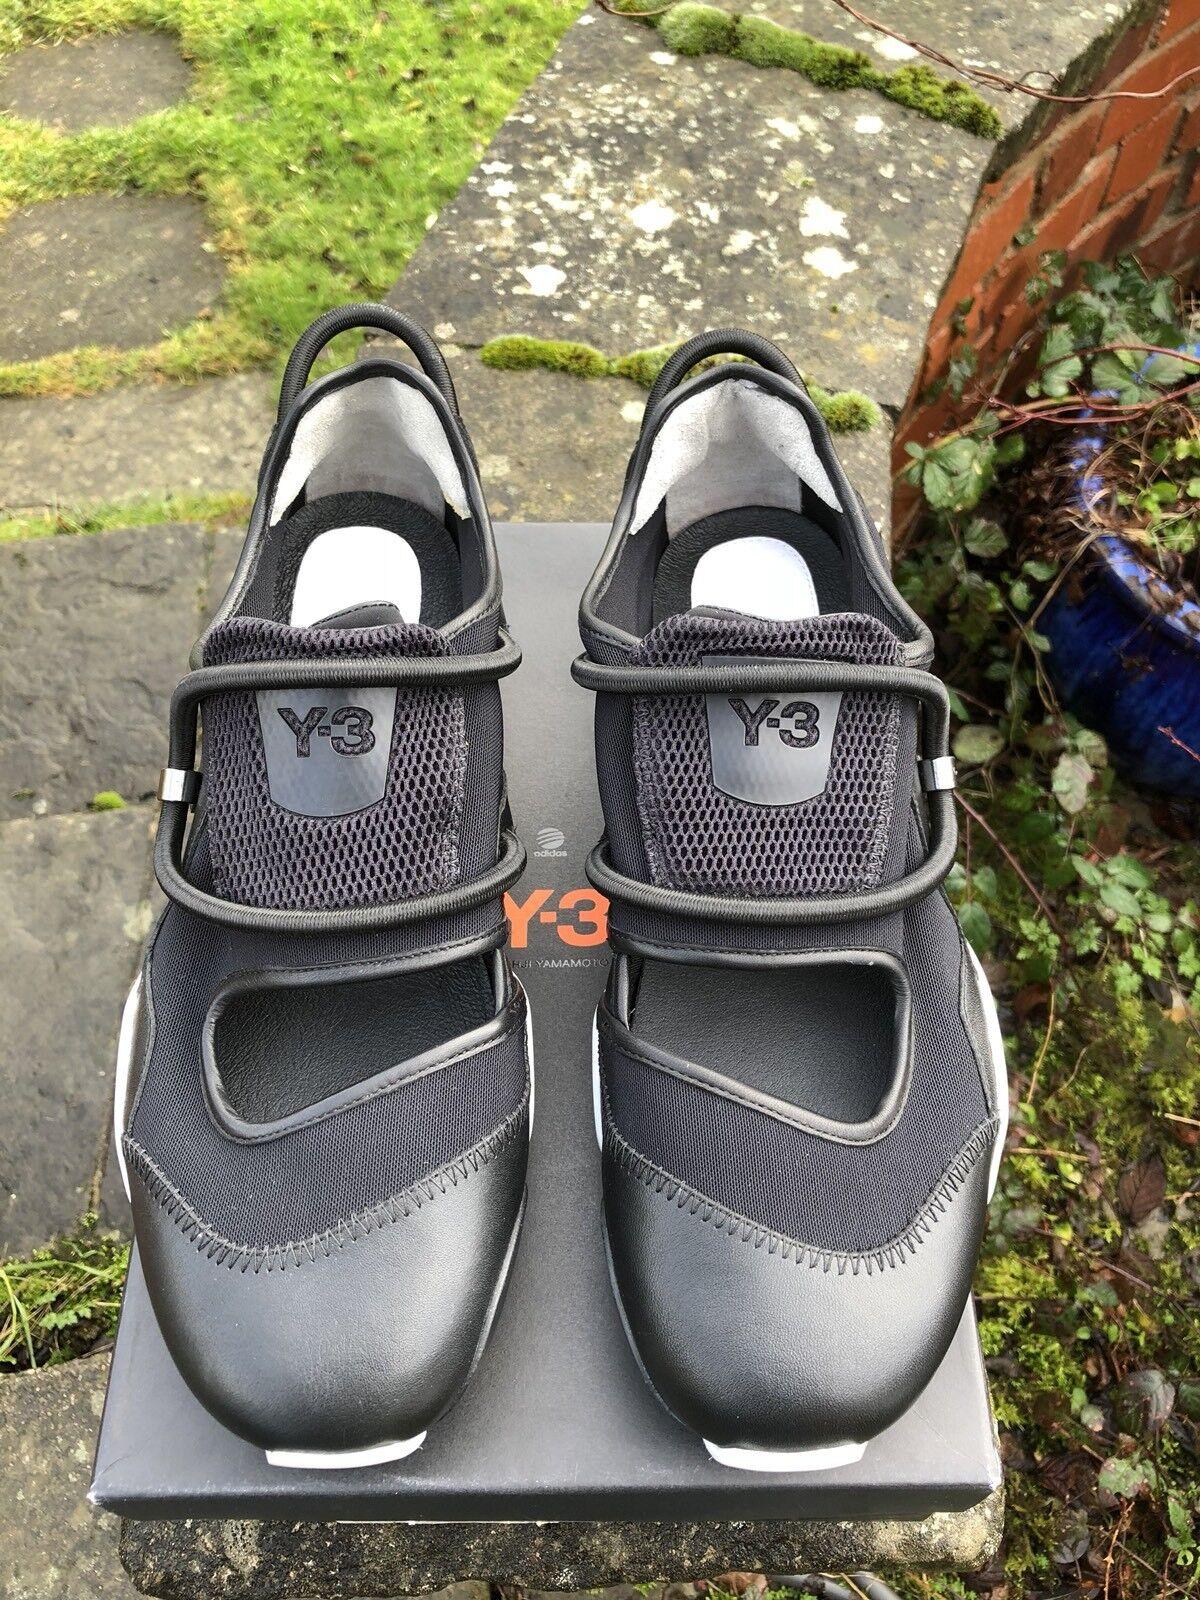 Adidas Low Y-3 Yohji Yamamoto Sly Low Adidas Noir & blanc  UK12 EU47.5 US12.5 V22266 BNIB 3901a0